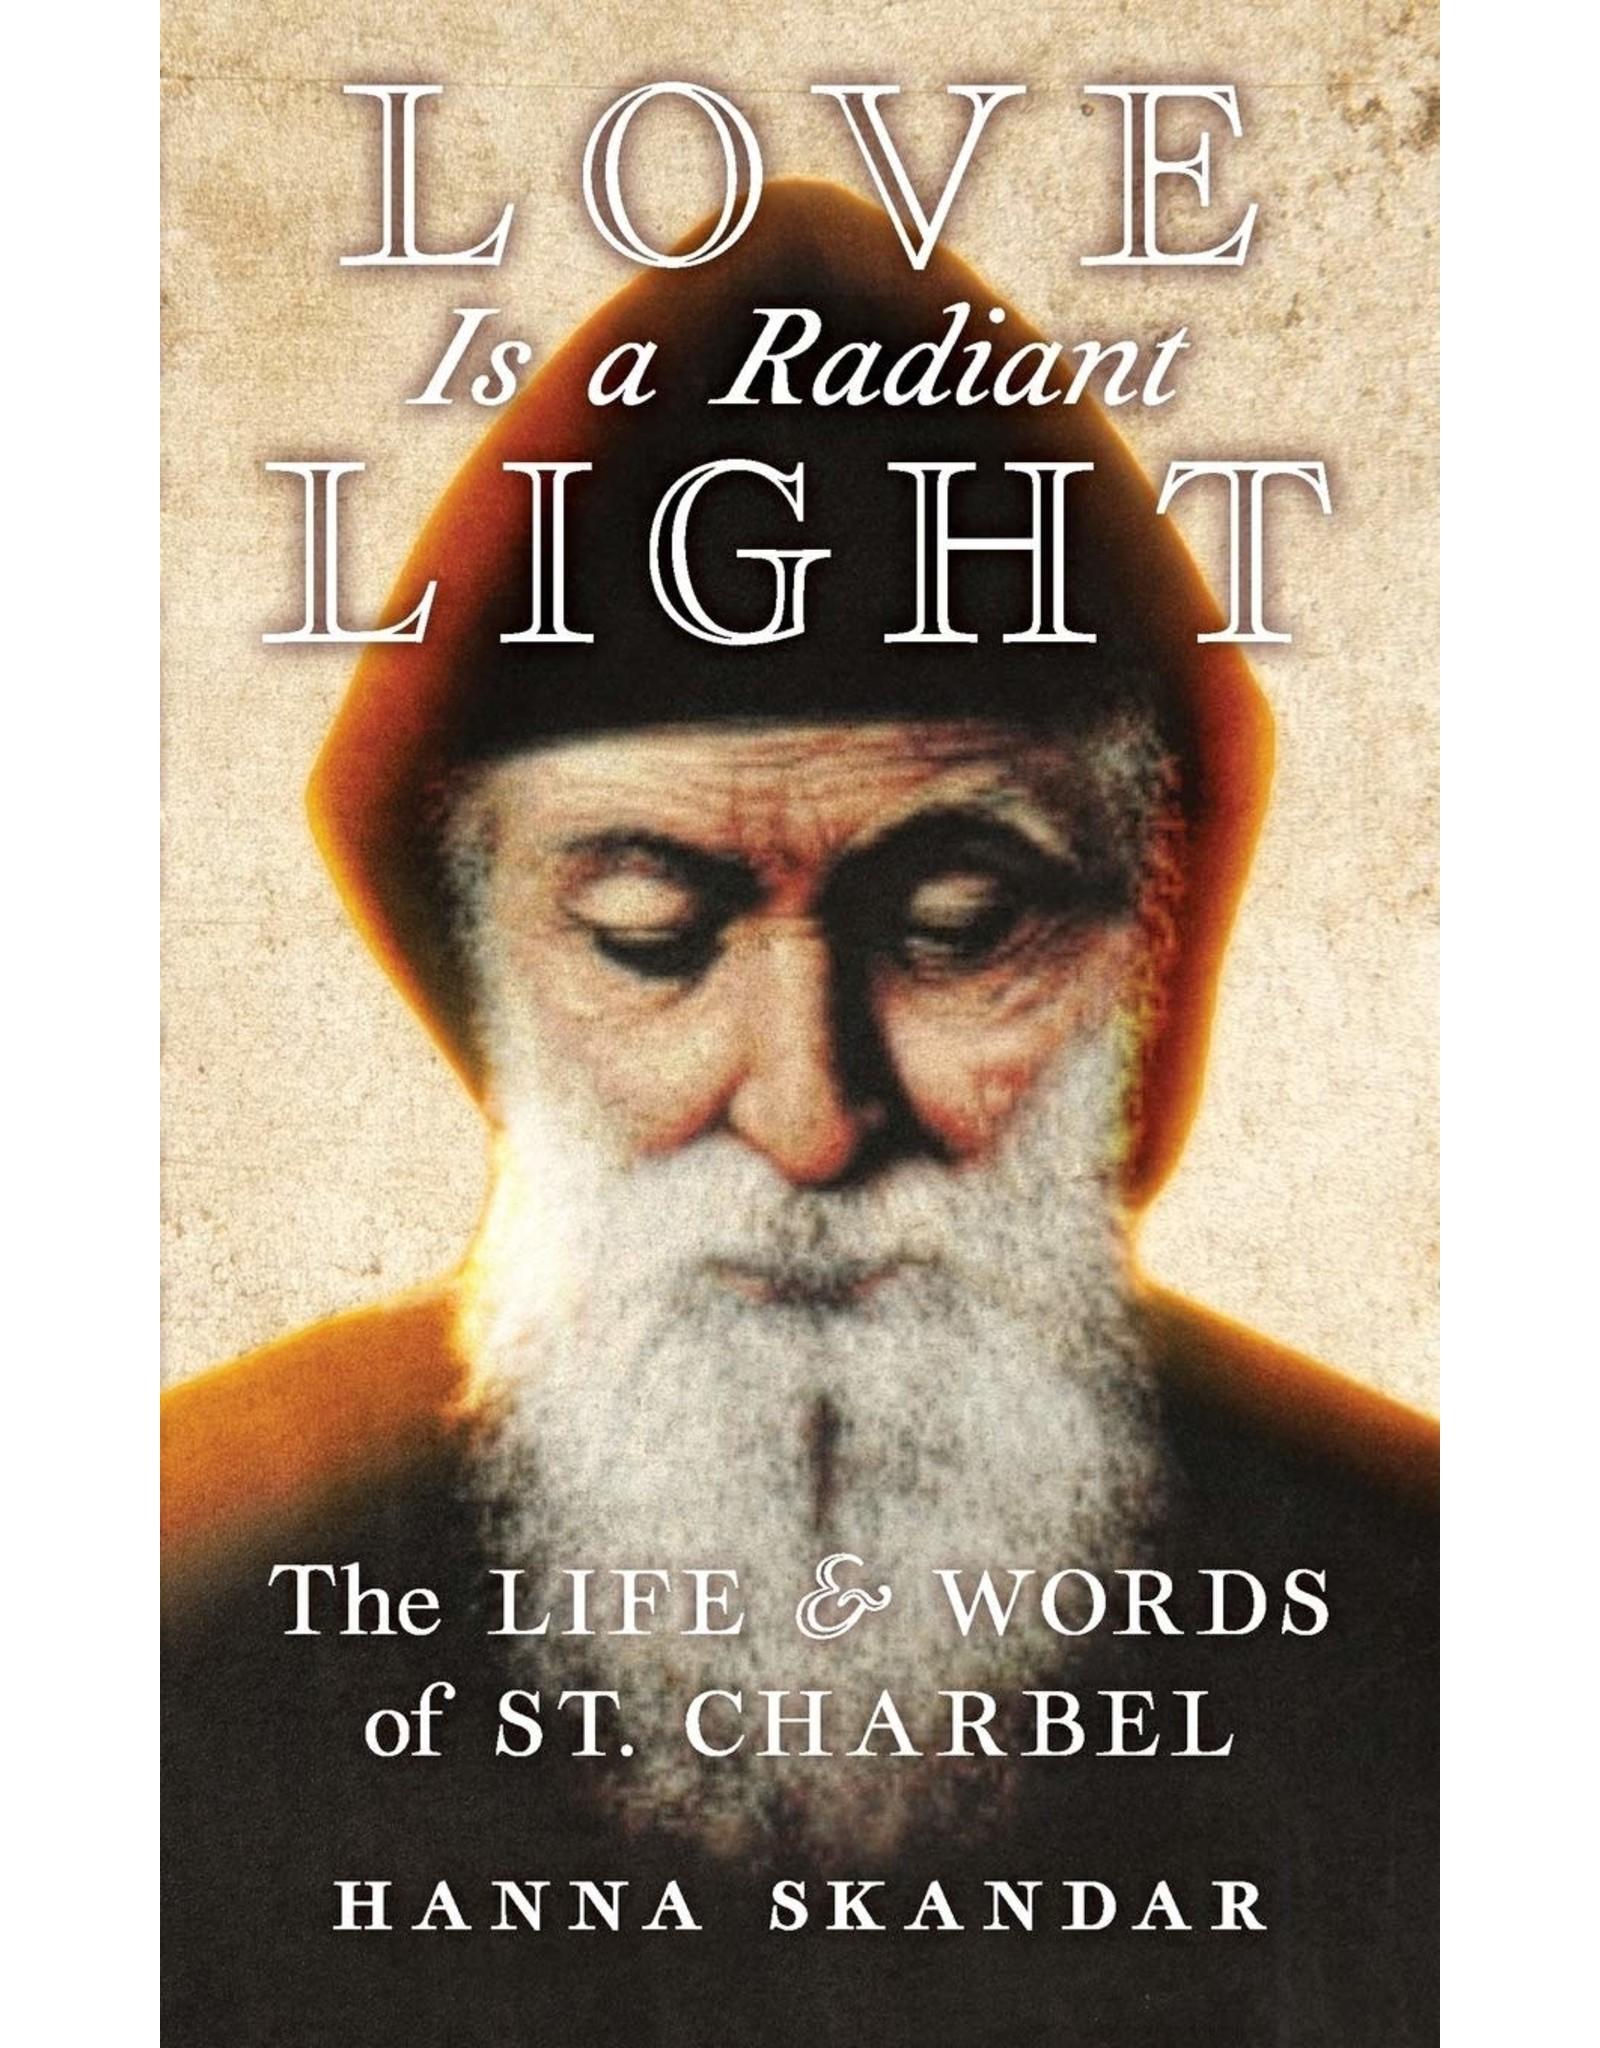 Skandar, Hanna Love is a Radiant Light: The Life & Words of Saint Charbel